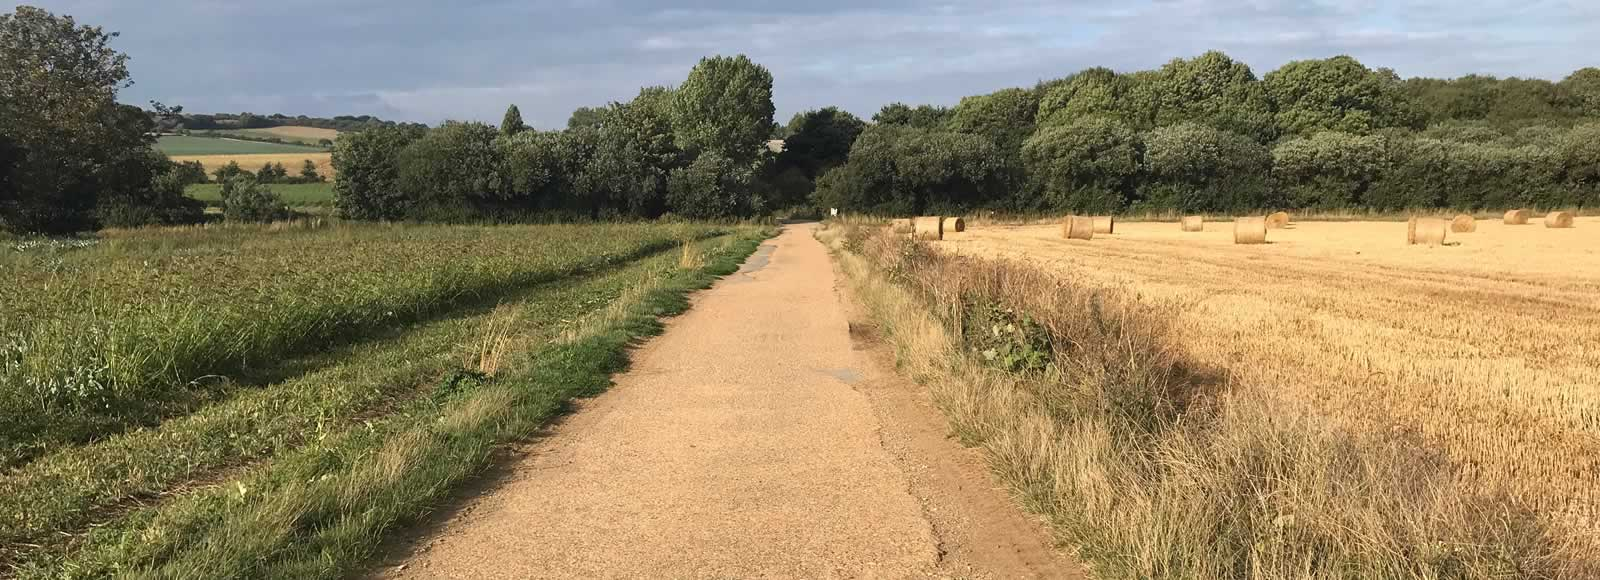 Cycle track through fields near Blackwater.